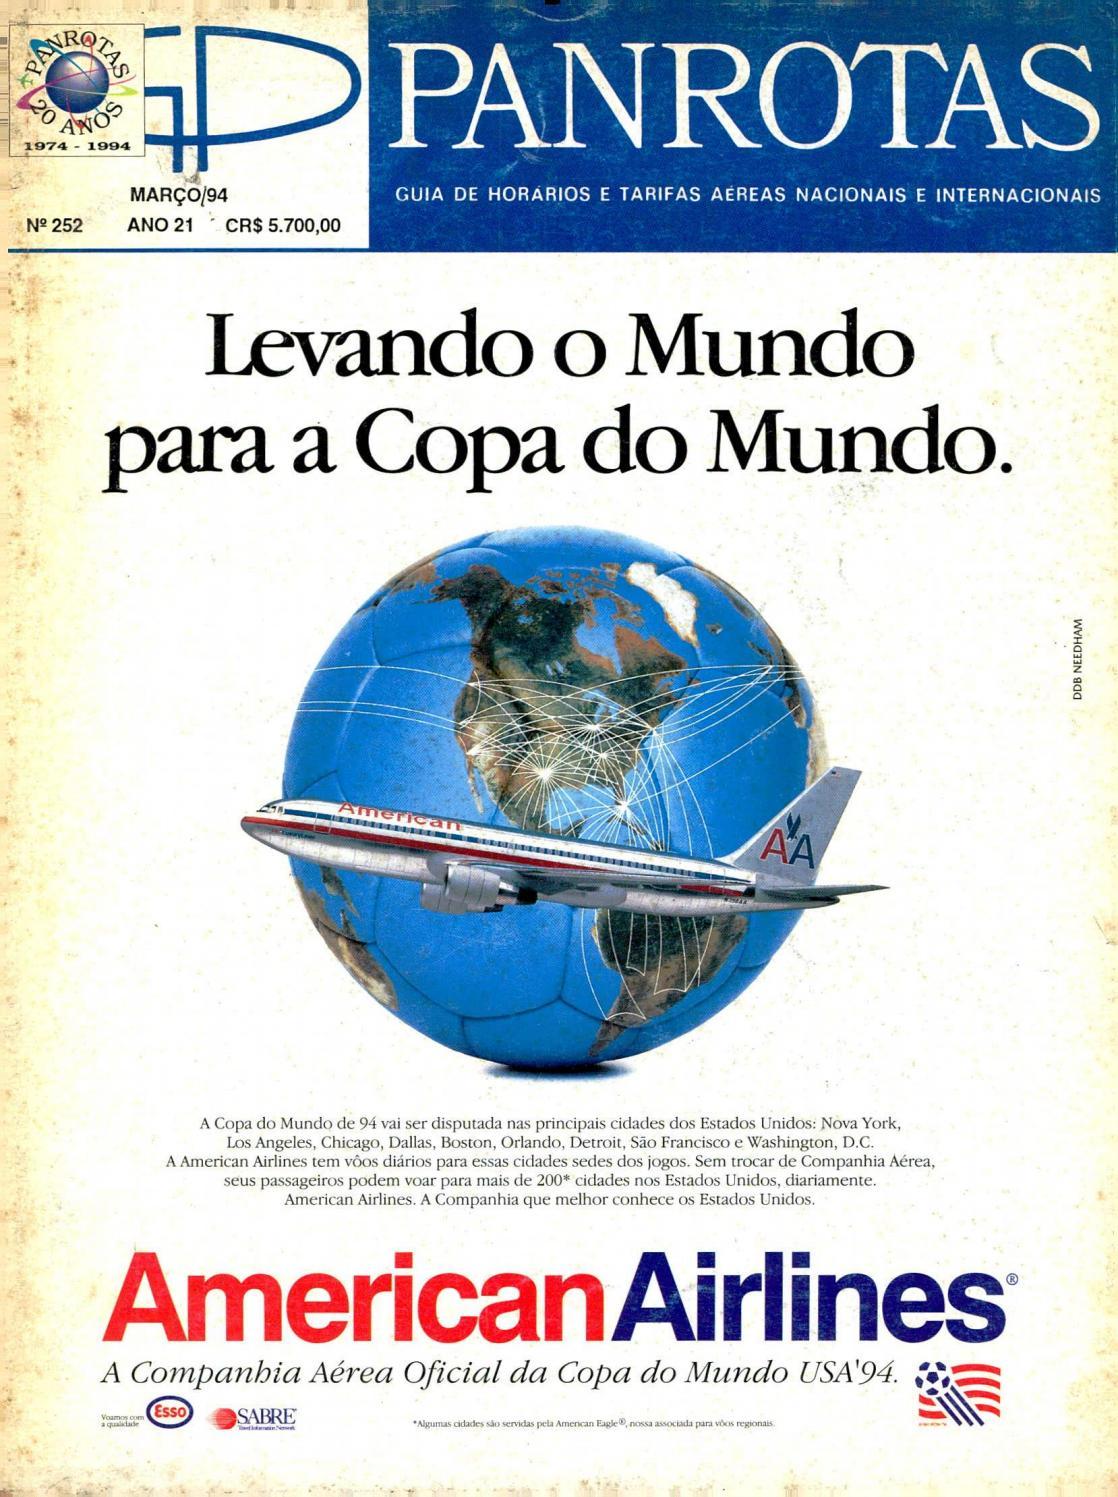 b31a8ca0dcd Guia PANROTAS - Edição 252 - Março 1994 by PANROTAS Editora - issuu